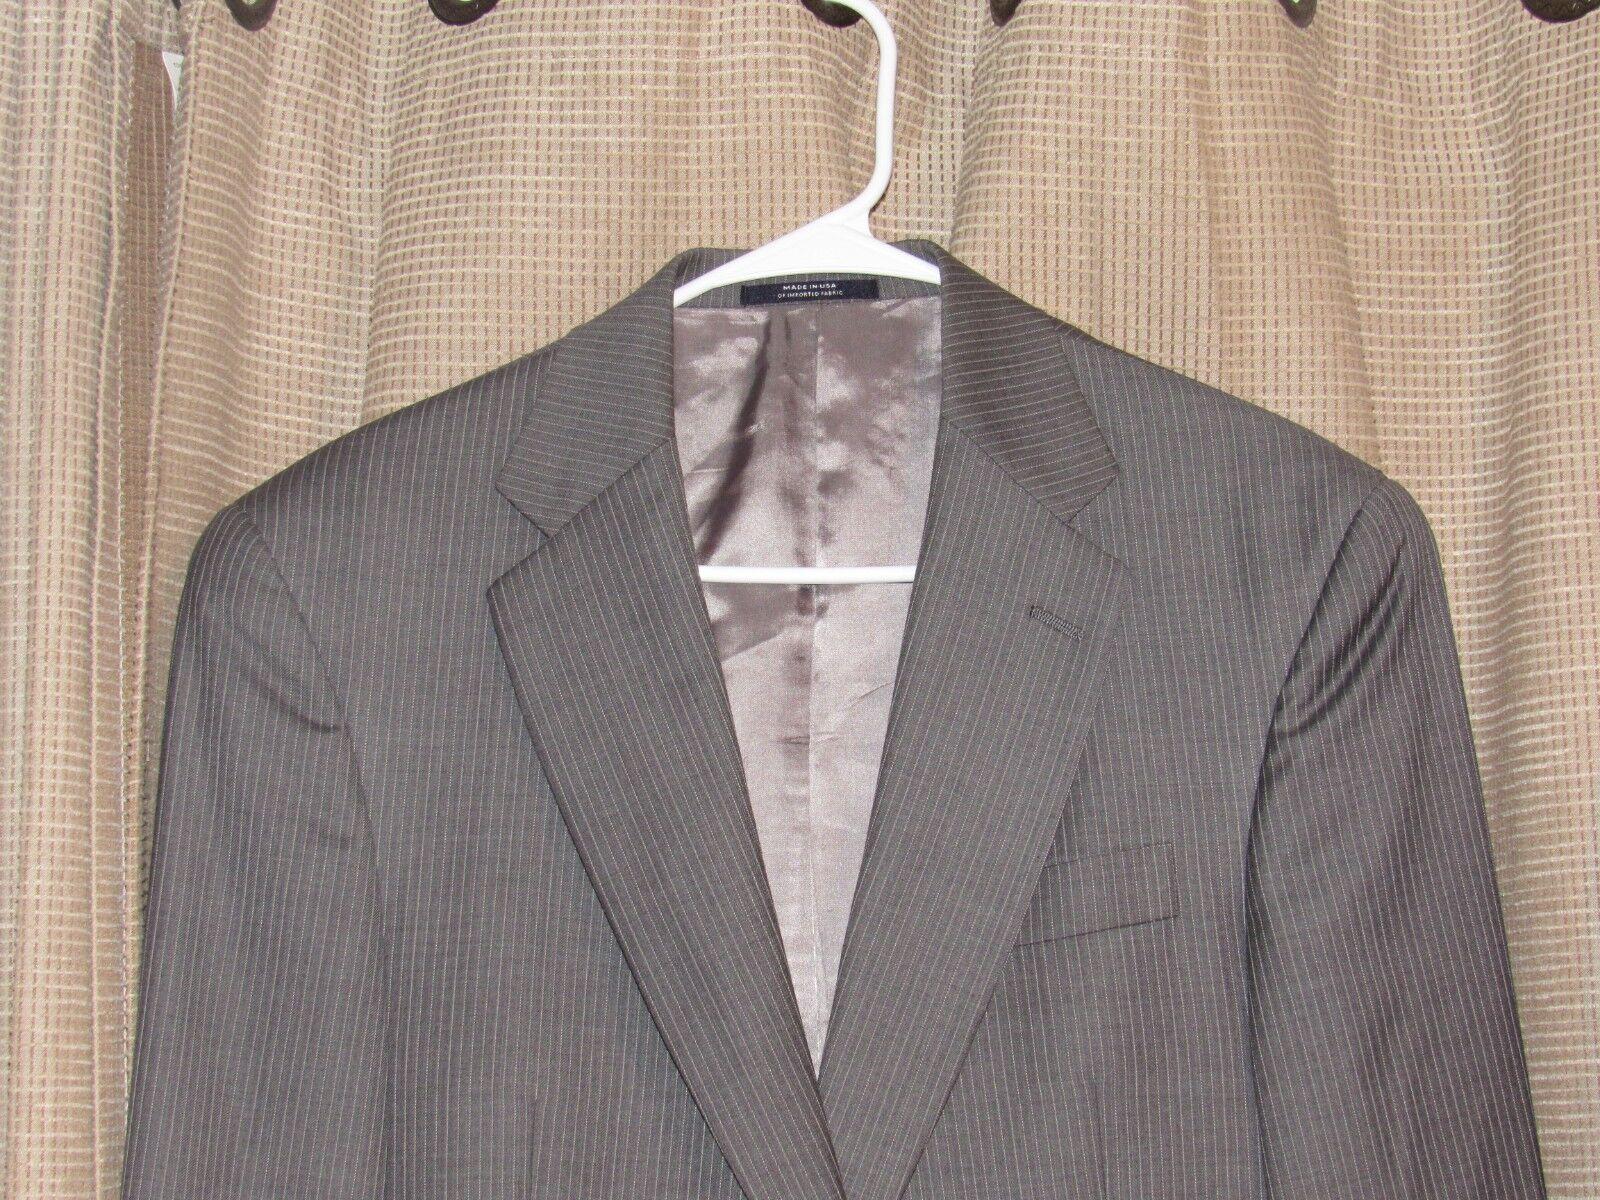 HART SCHAFFNER MARX 38 reg grau pinstripe suit SEE OTHER 31 x 29 pleat pants